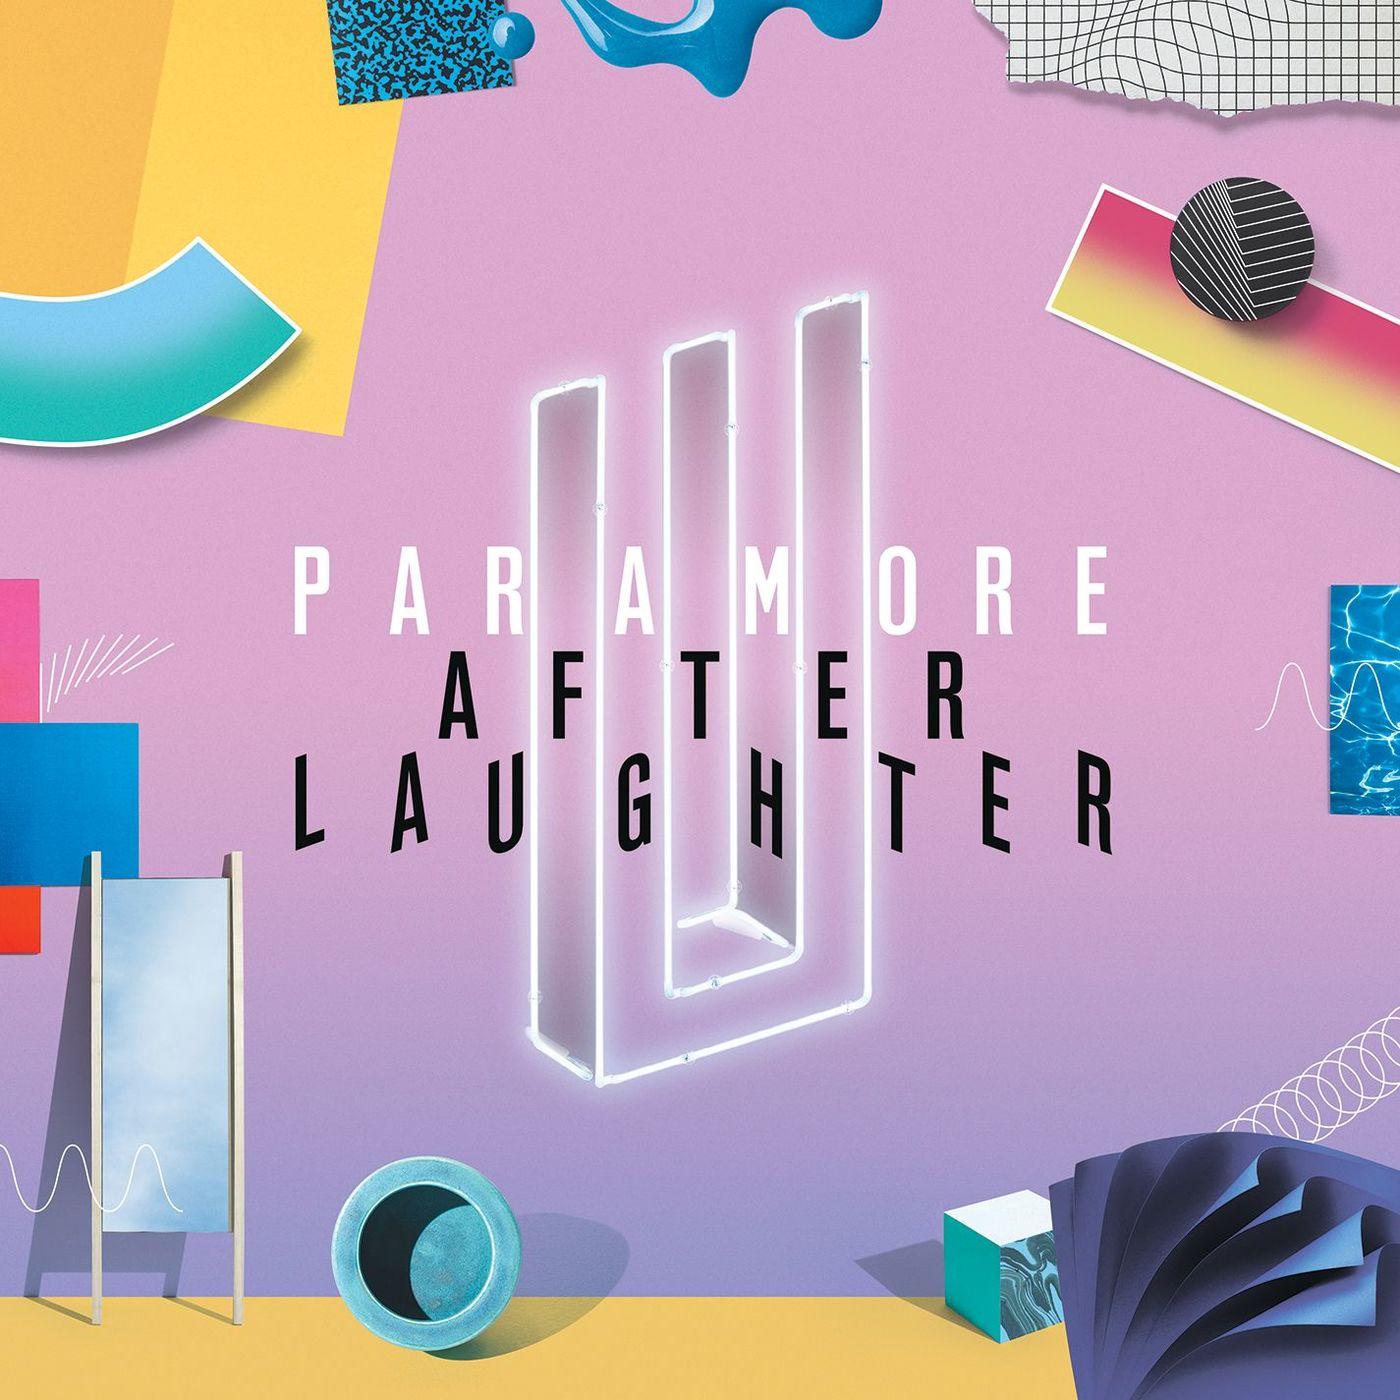 Paramore misery business amazon. Com music.